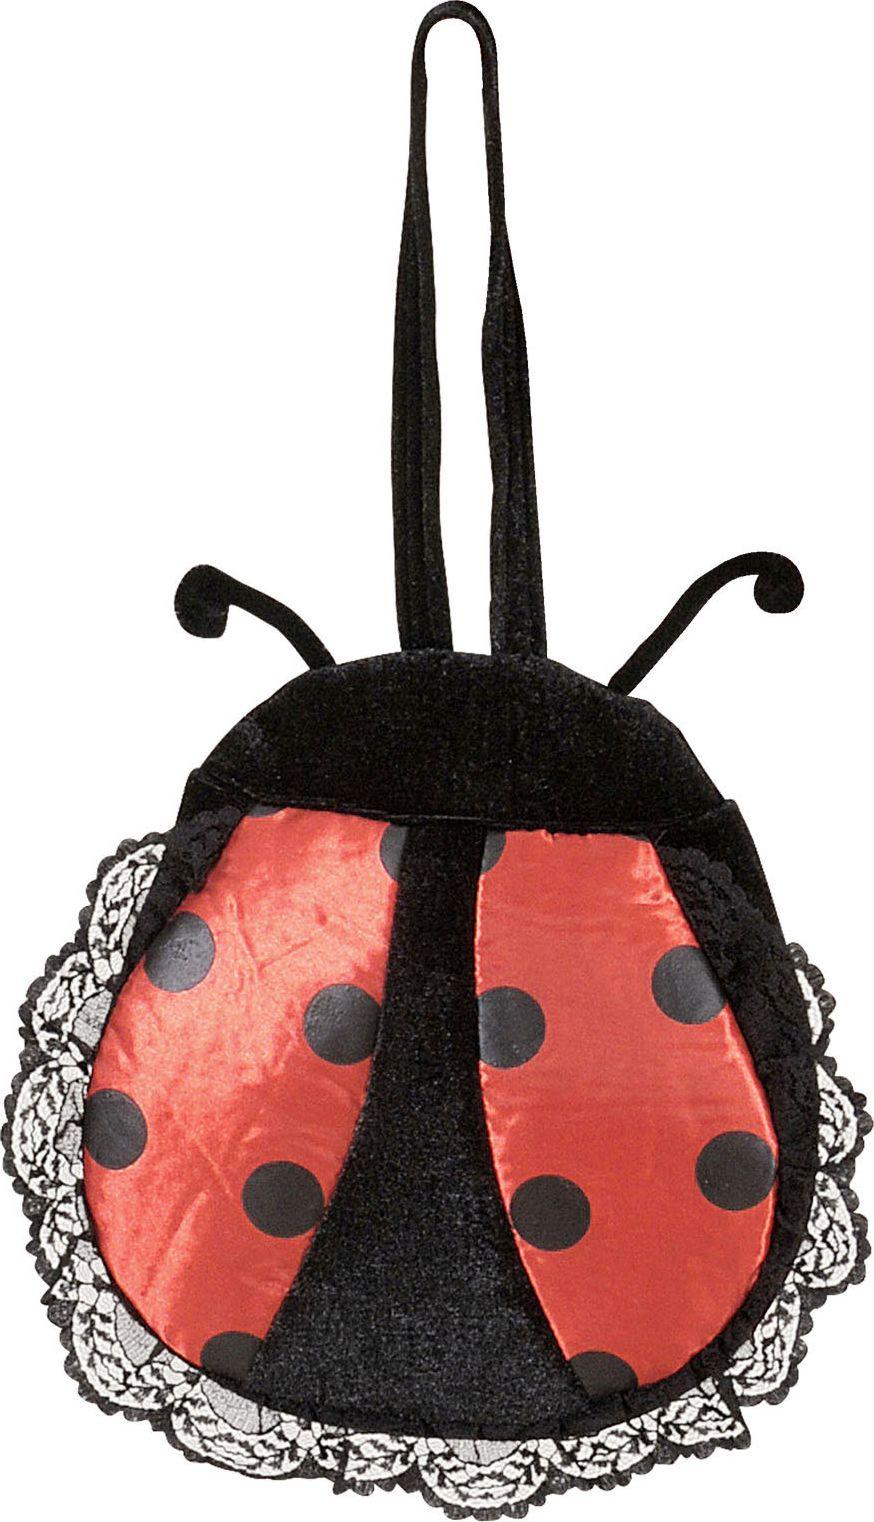 Lieveheersbeestje handtasje